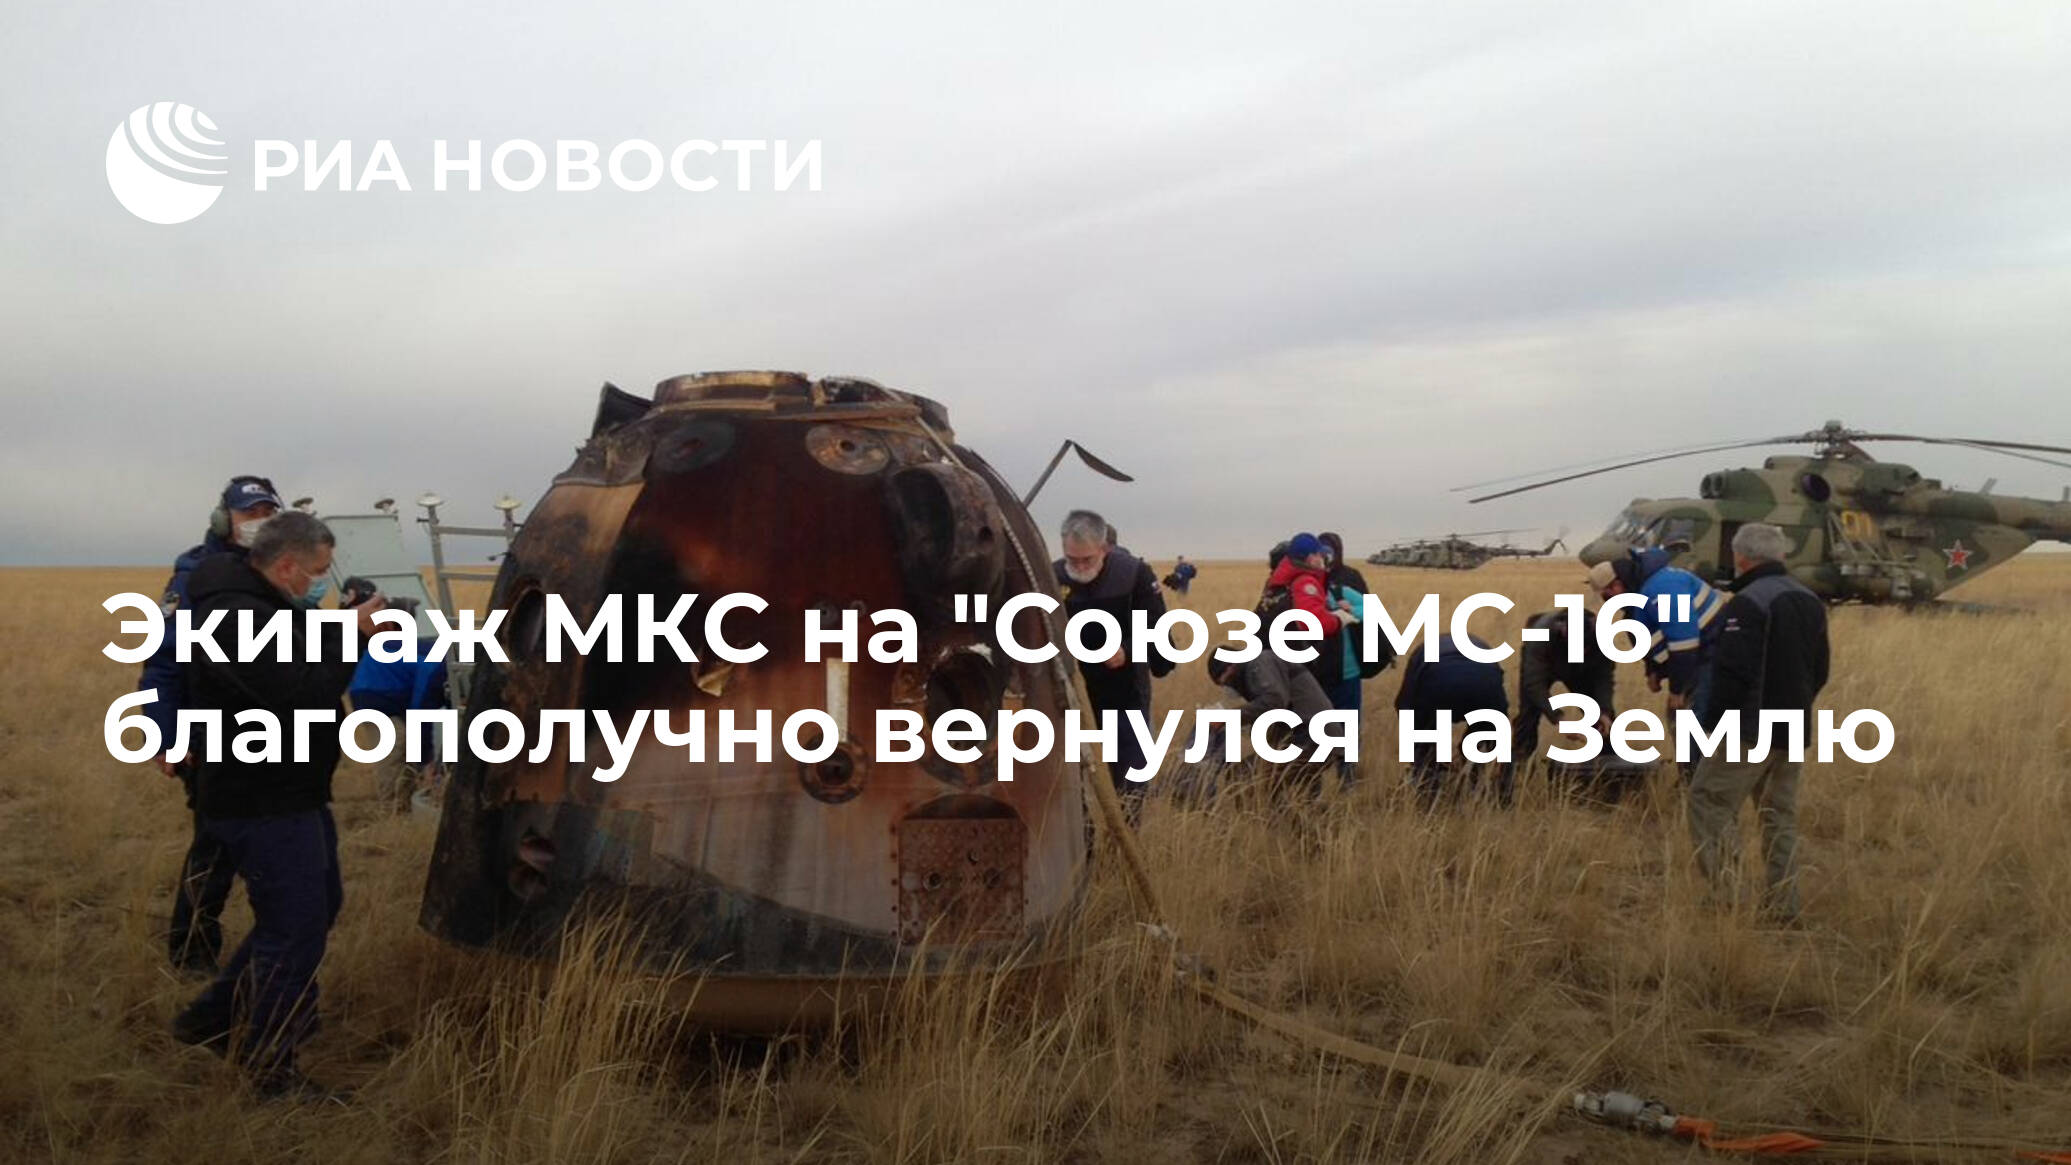 Экипаж МКС на 'Союзе МС-16' благополучно вернулся на Землю